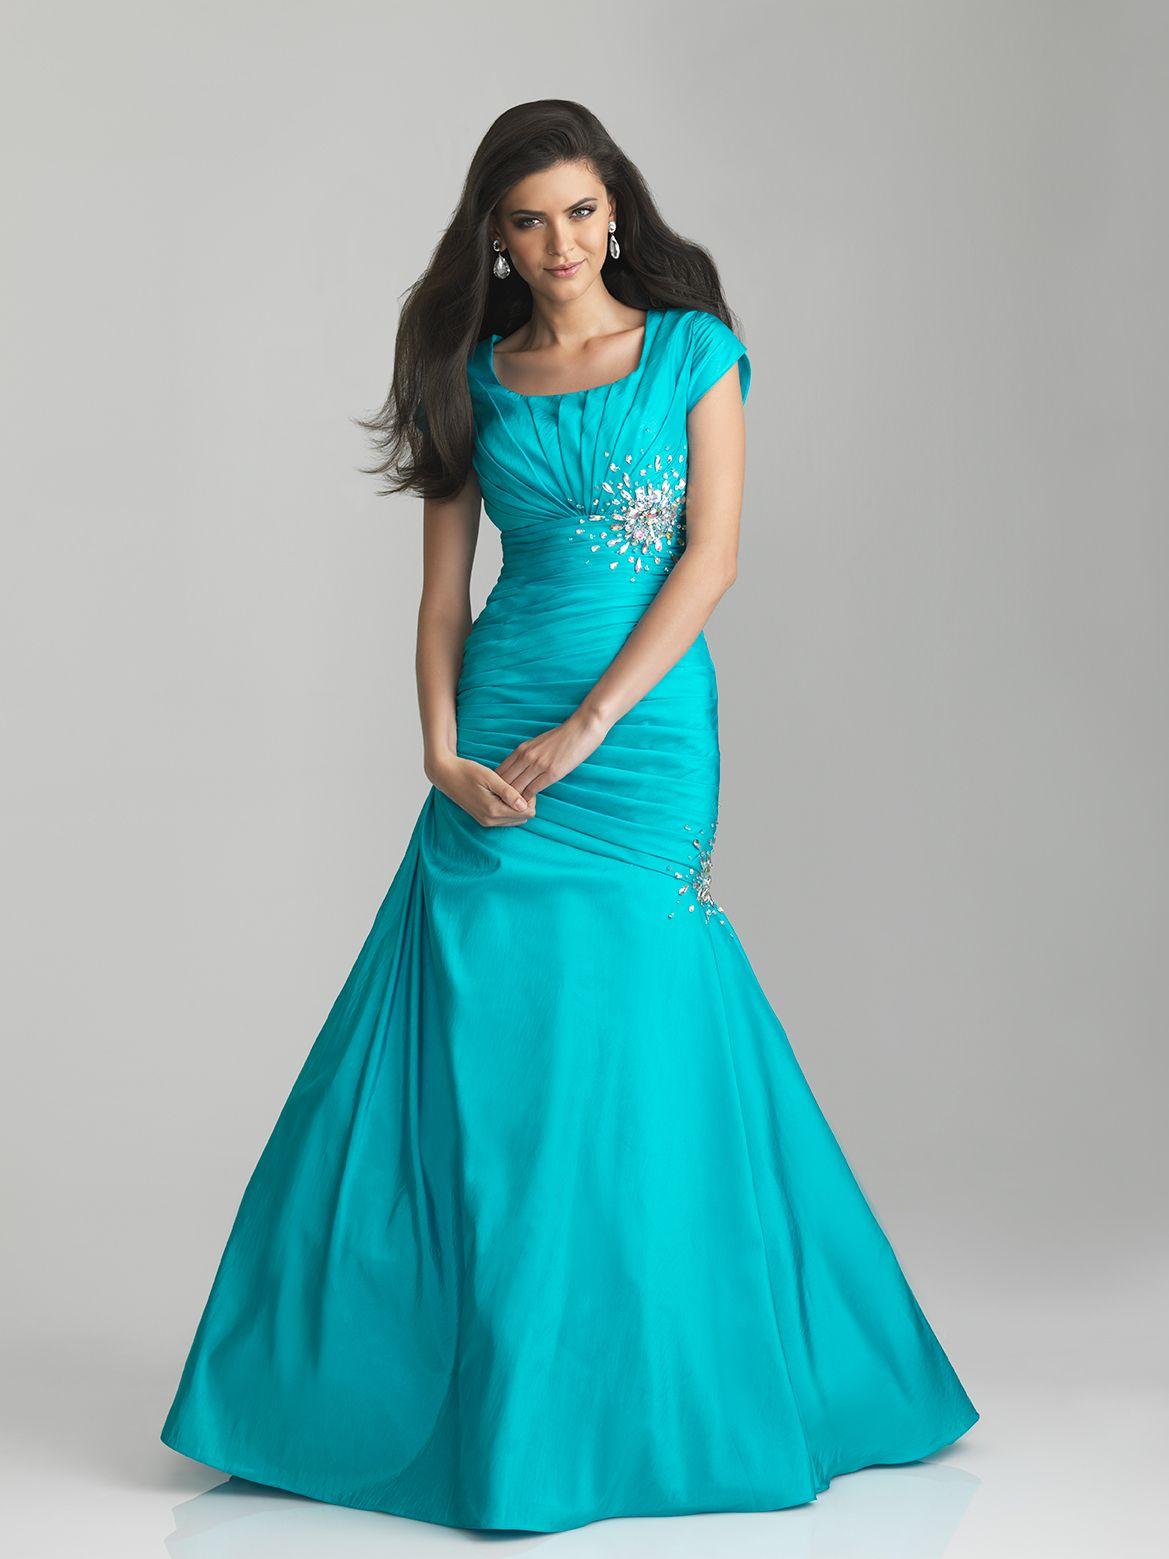 Modest lds prom dresses discount evening dresses for Modest wedding dresses seattle